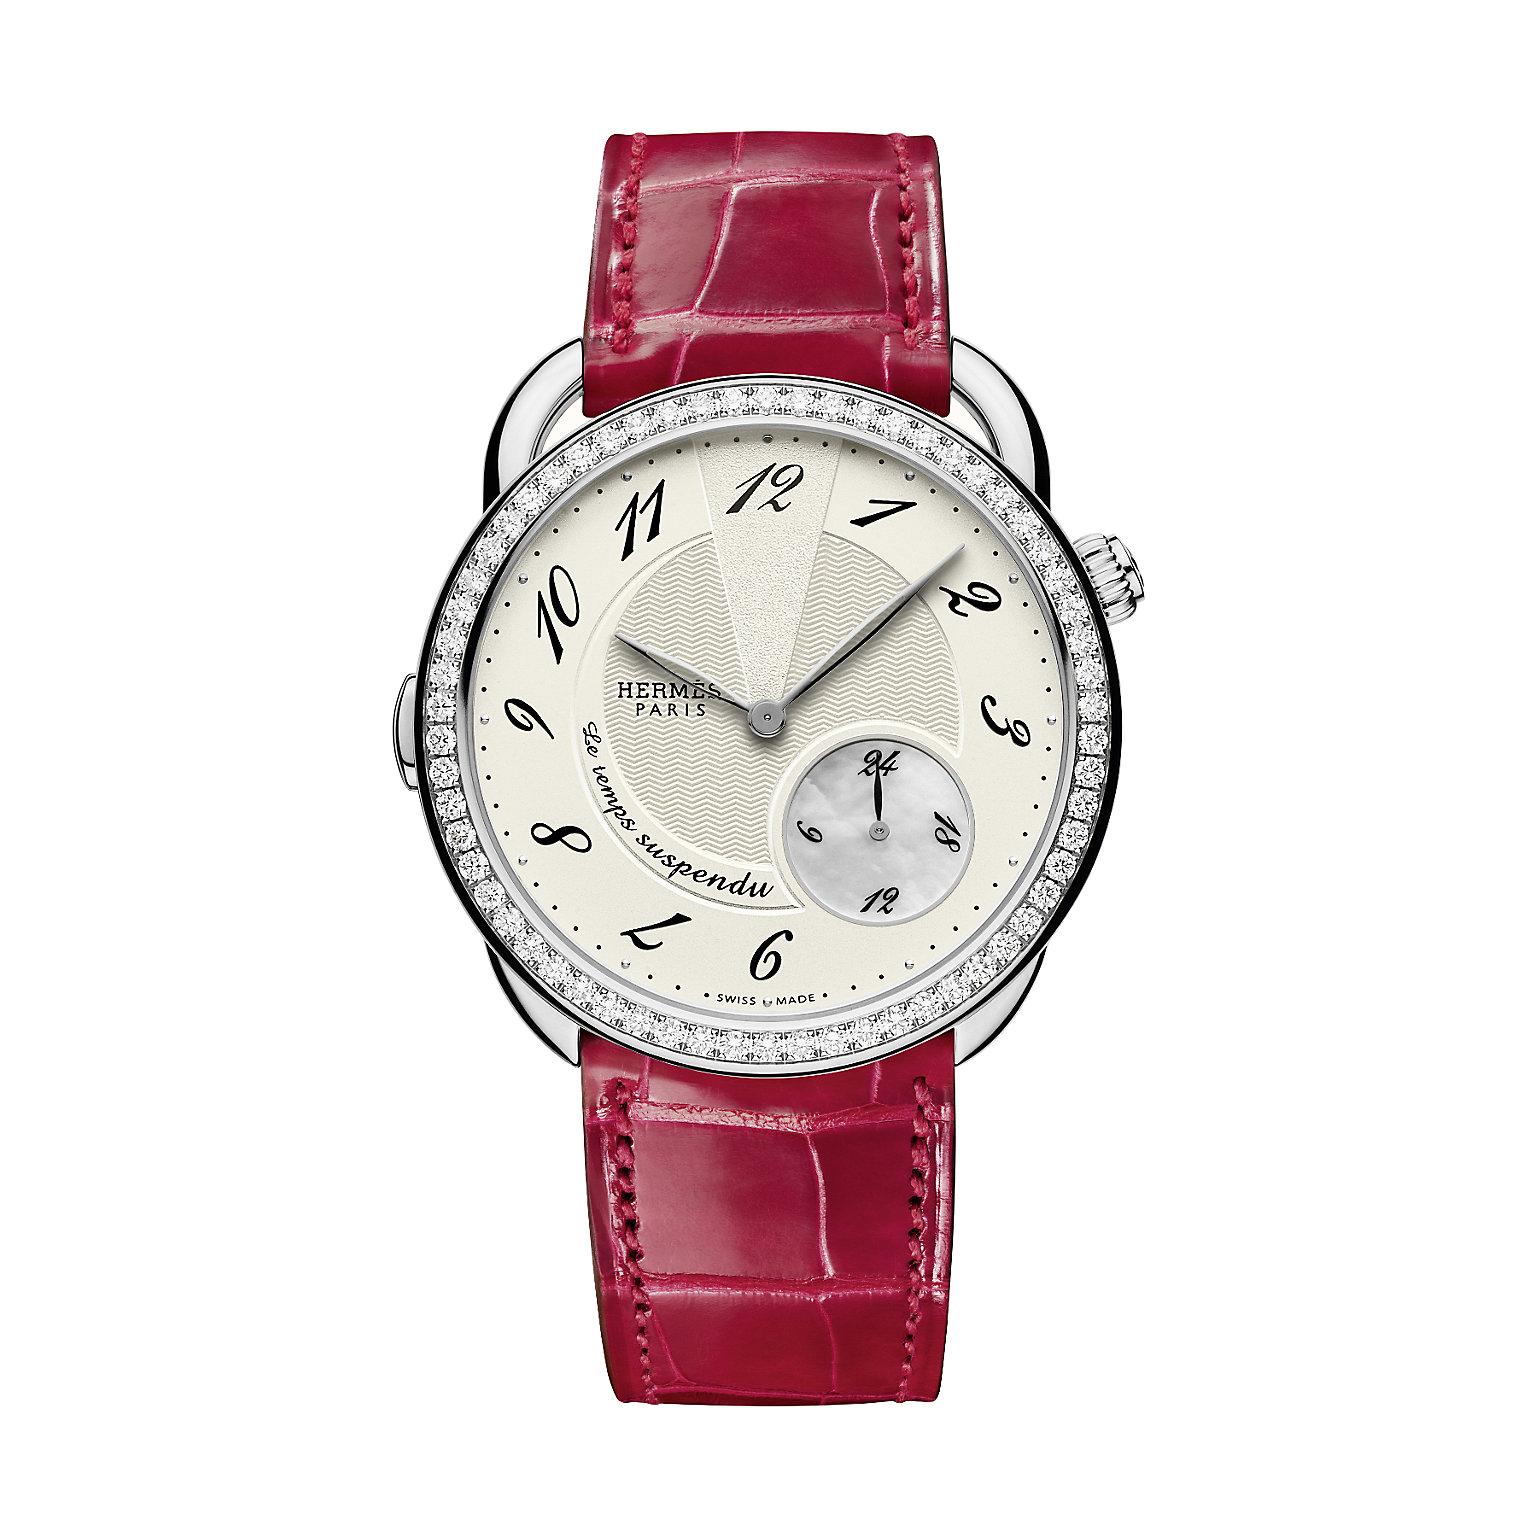 Hermès-arceau-le-temps-suspendu-38mm-Hall-of-Time-040287WW00